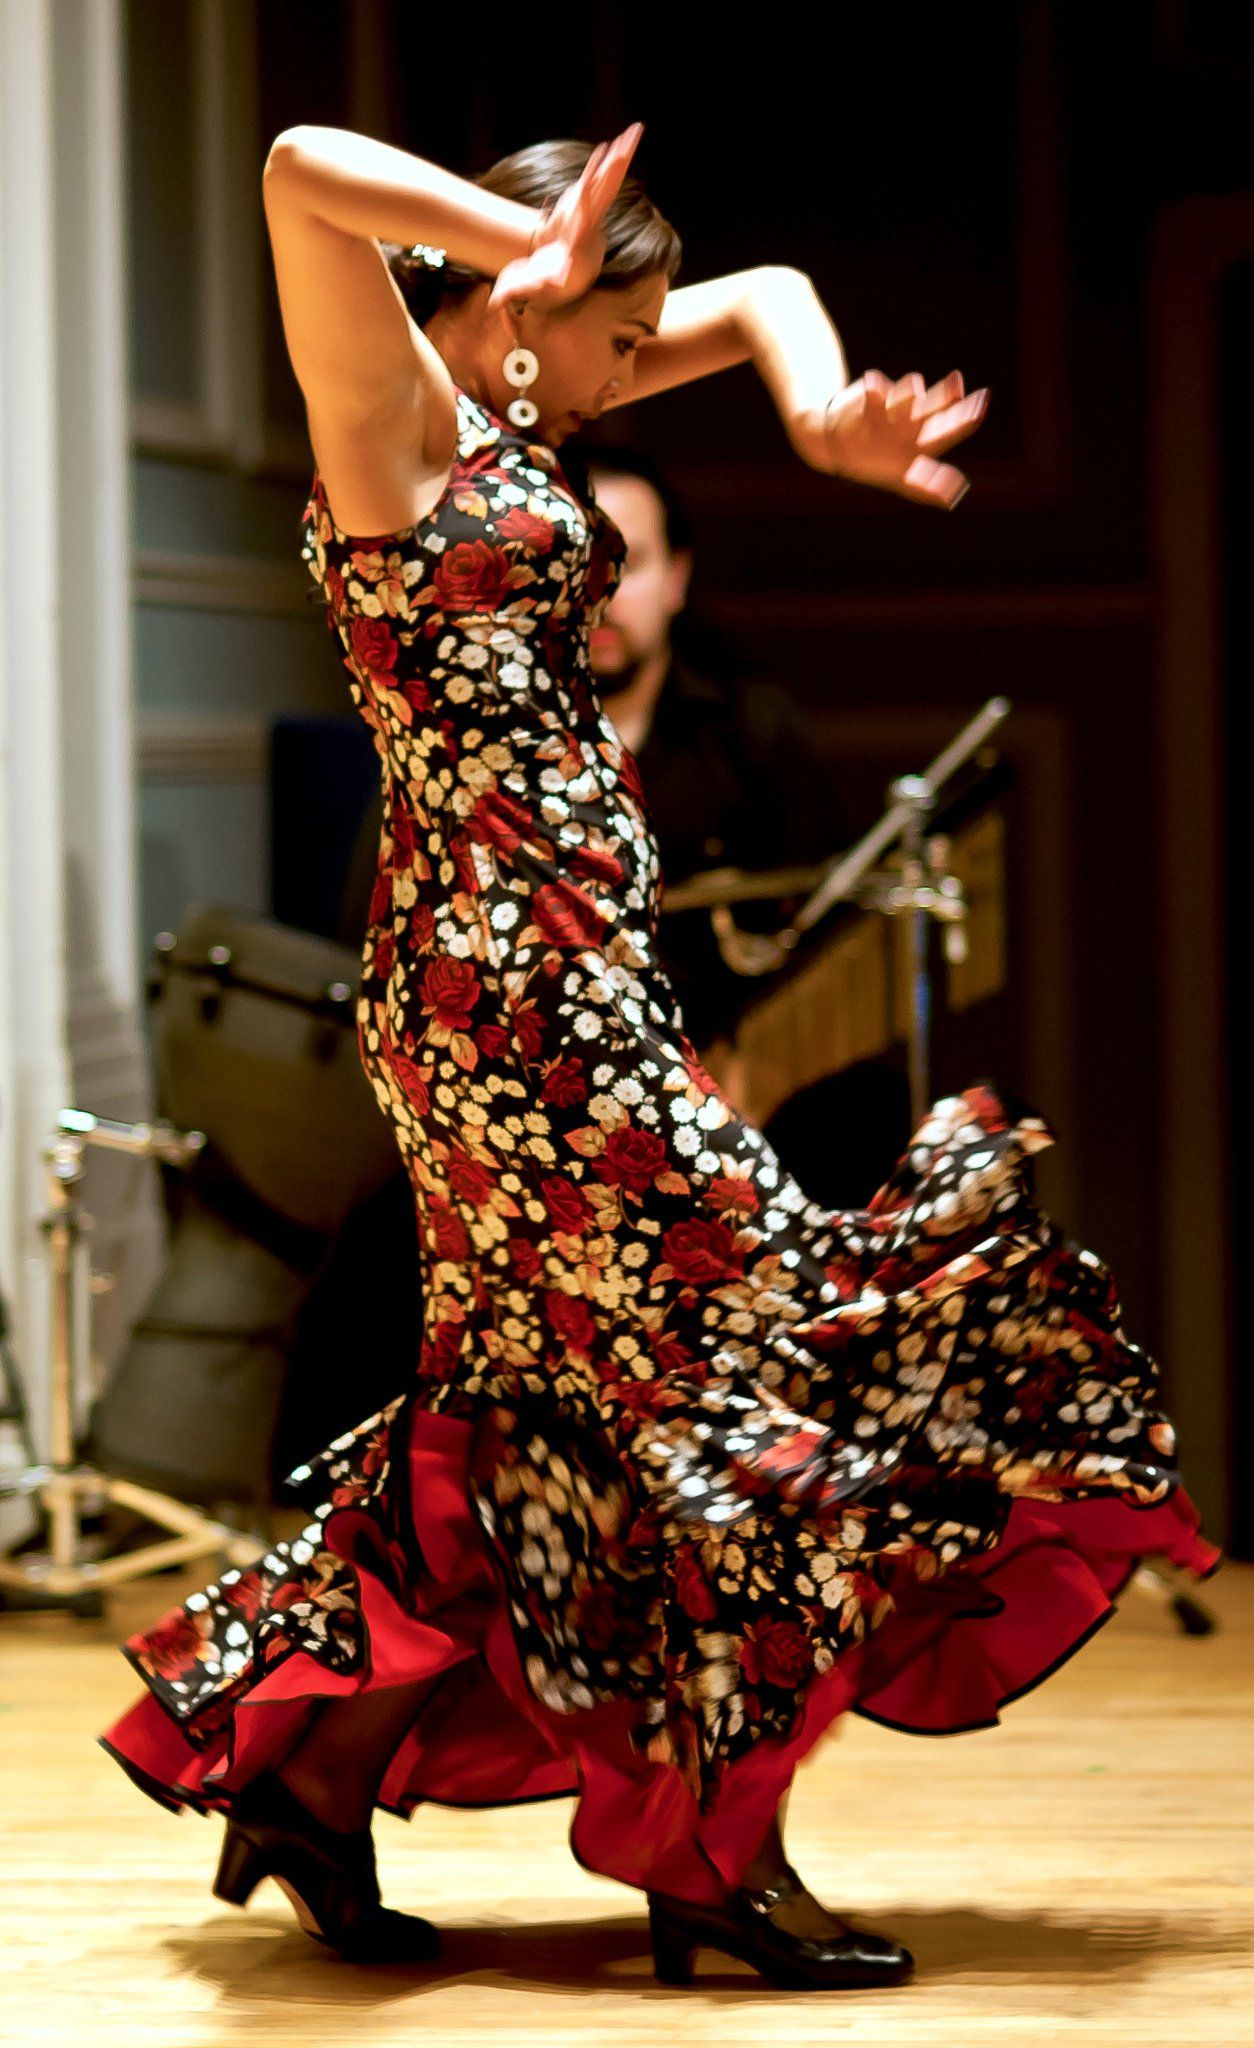 Fall Flamenco Classes at Pasión y Arte Conservatory (With